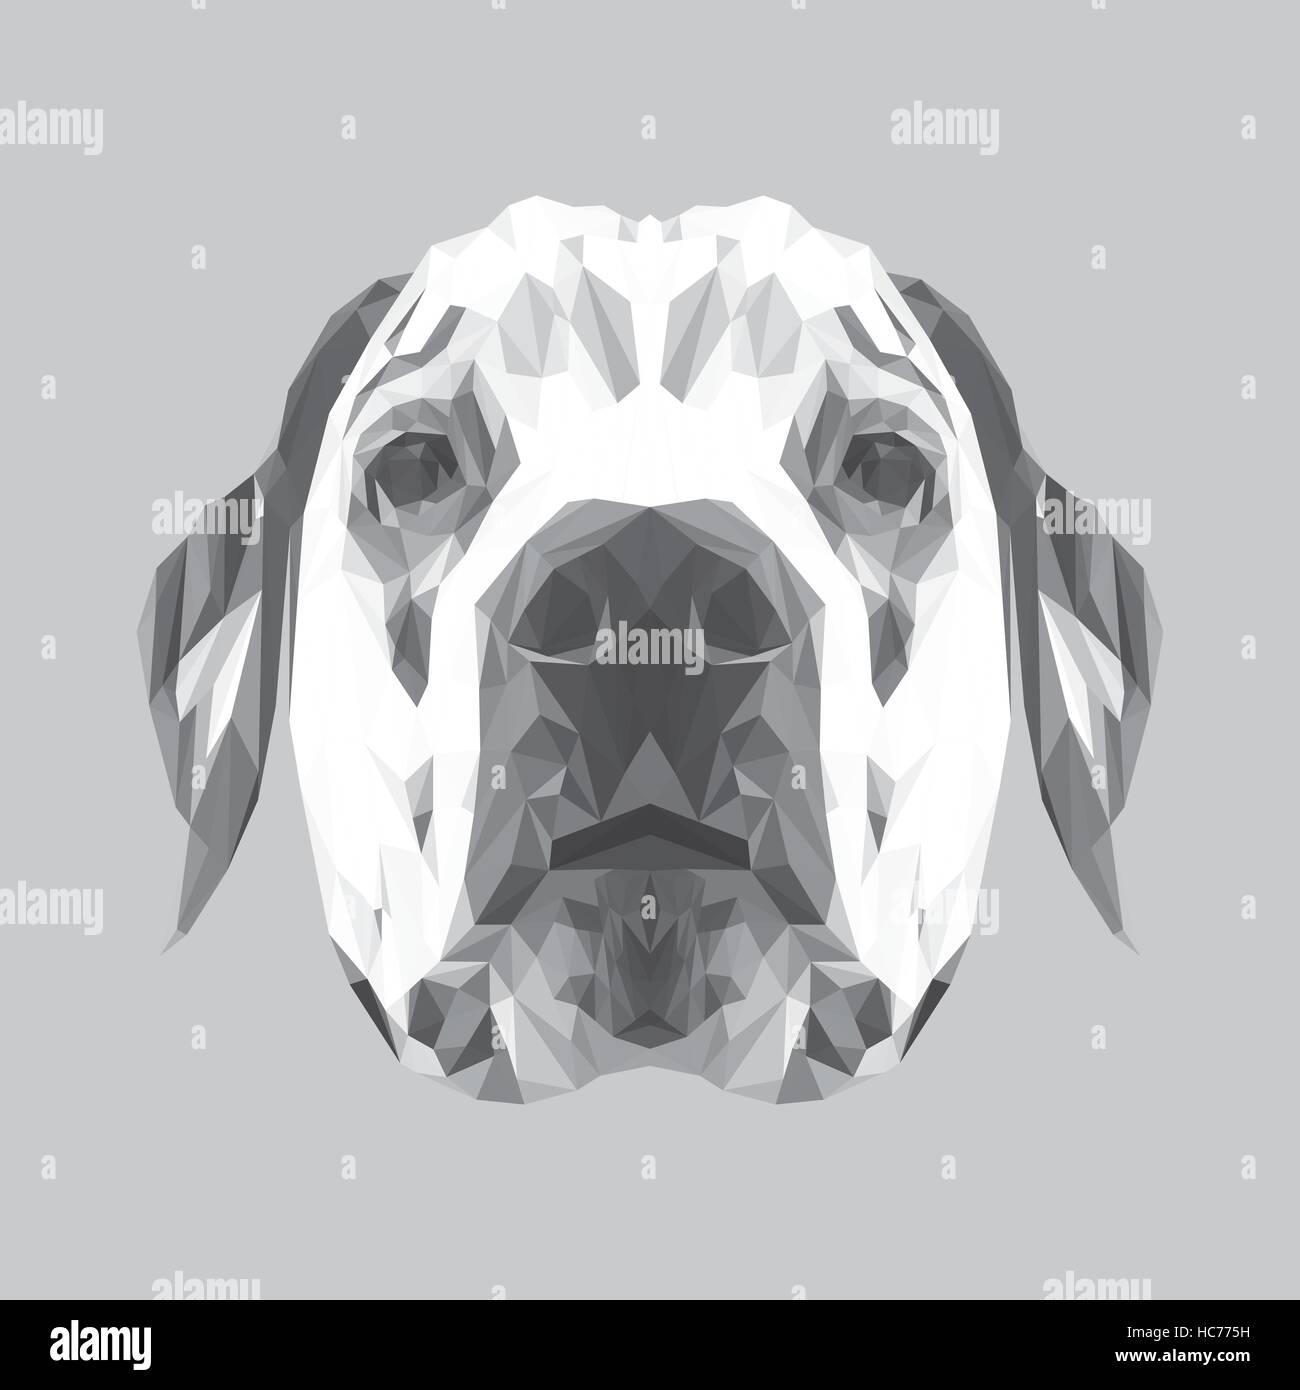 Dalmatian dog low poly design. Triangle vector illustration - Stock Vector